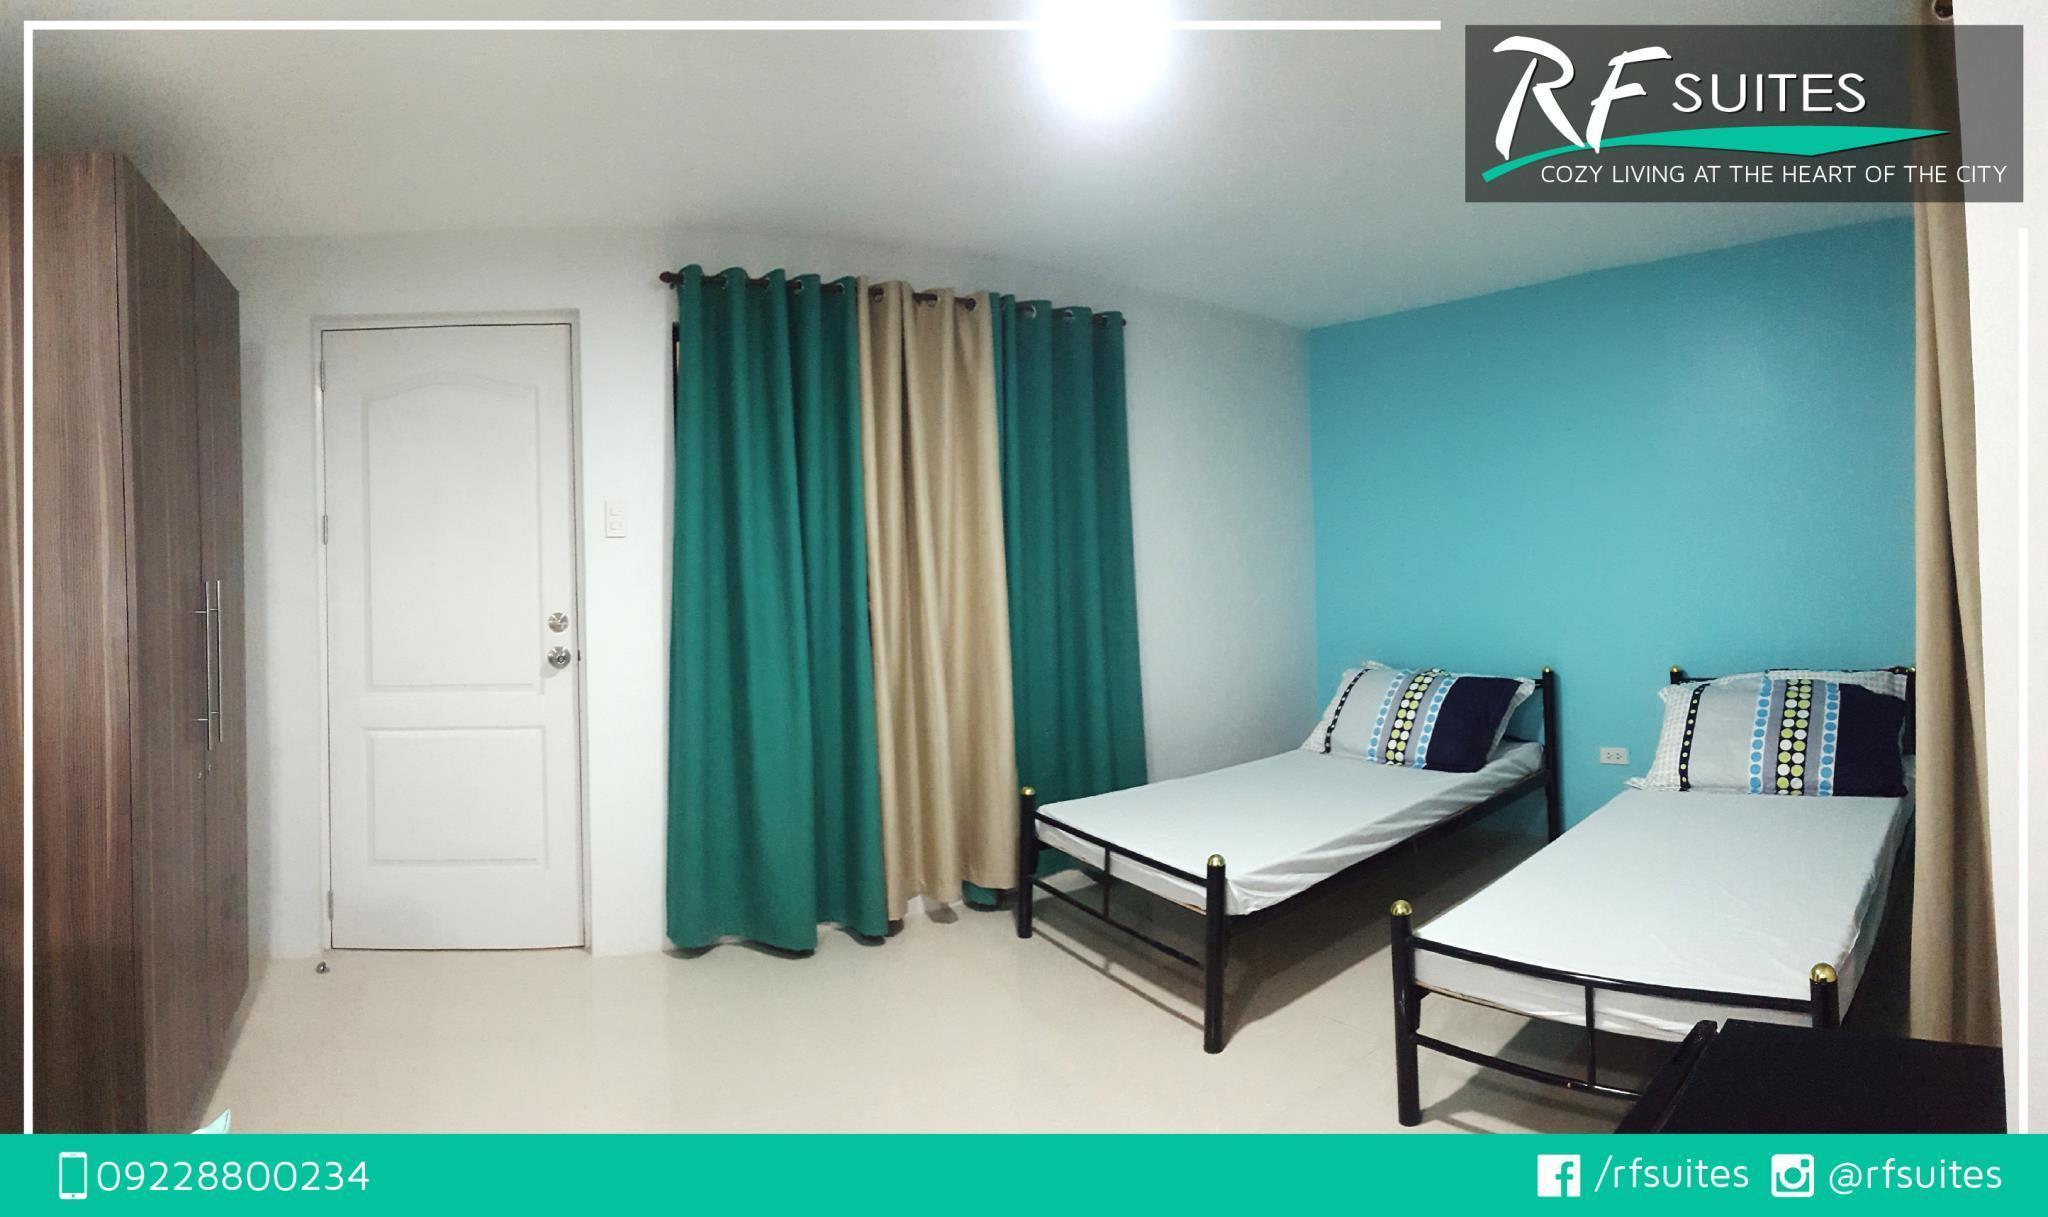 「rf suites cebu」の画像検索結果